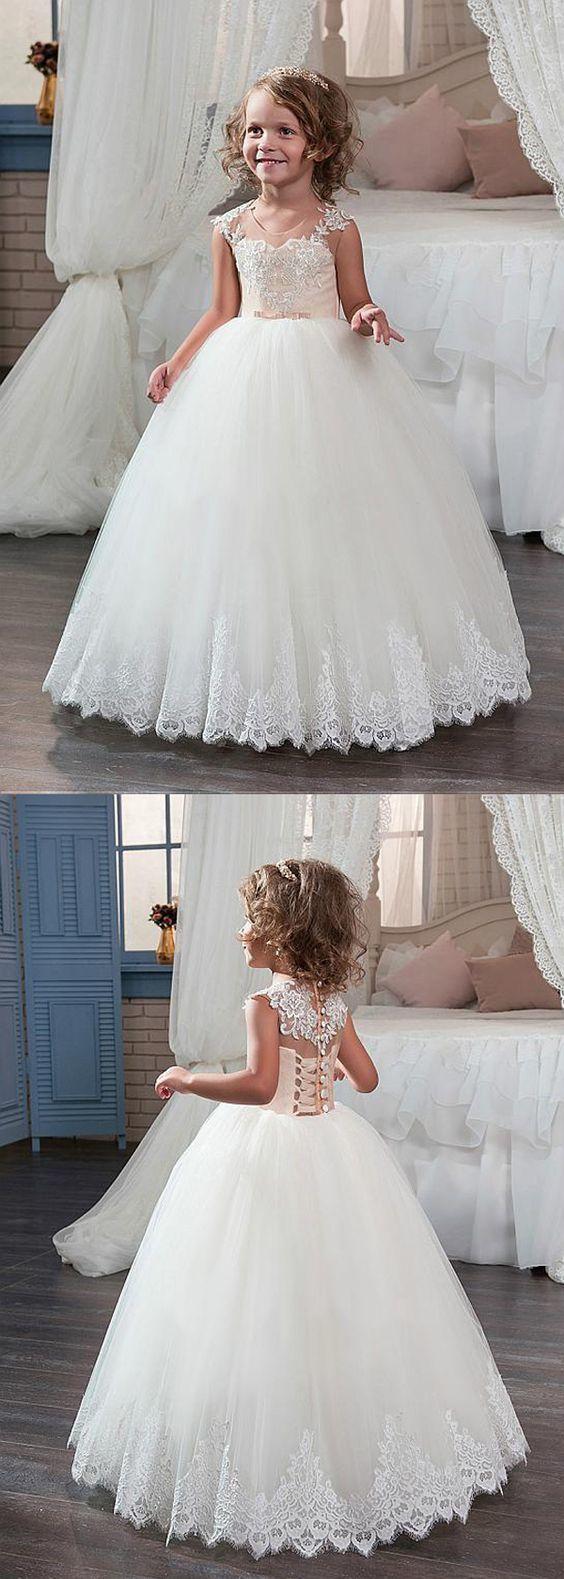 Stunning tulle u satin scoop neckline ball gown flower girl dress